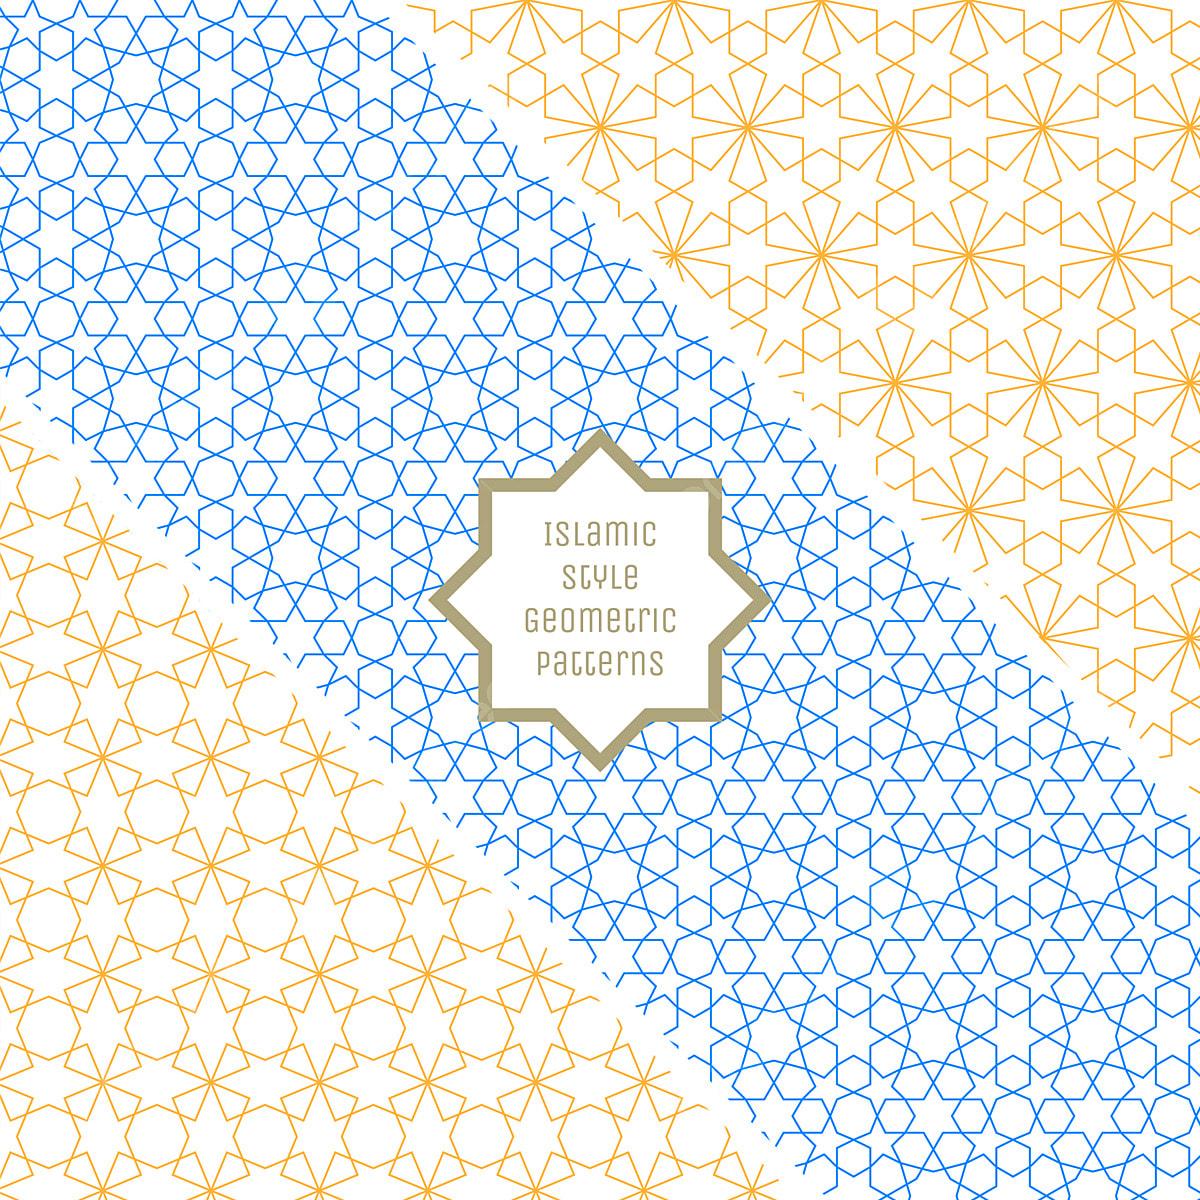 Islamic Style Seamless Geometric Patterns Collection